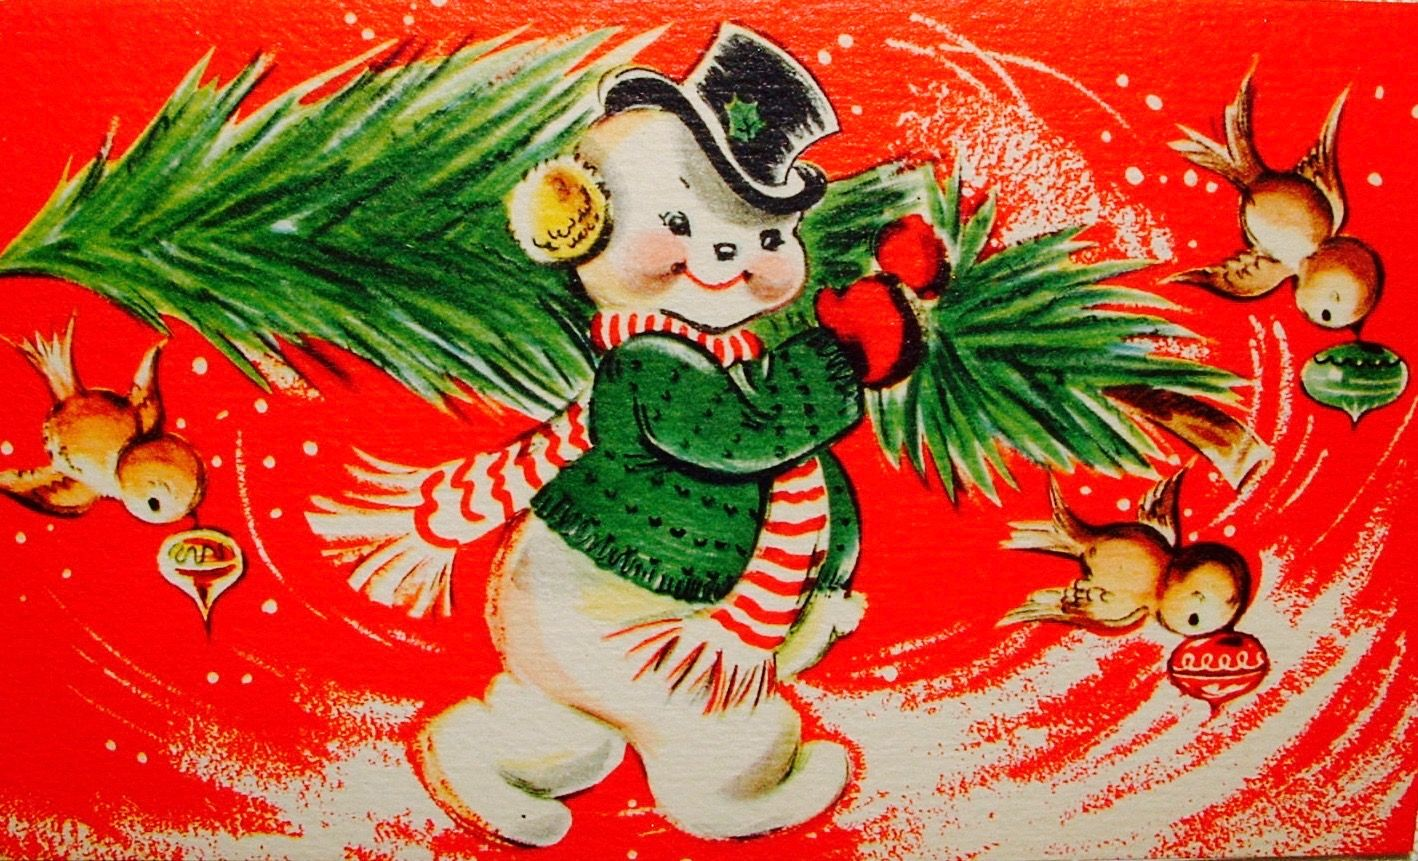 Vintage Snowman. Vintage Christmas Card. Retro Christmas Card ...